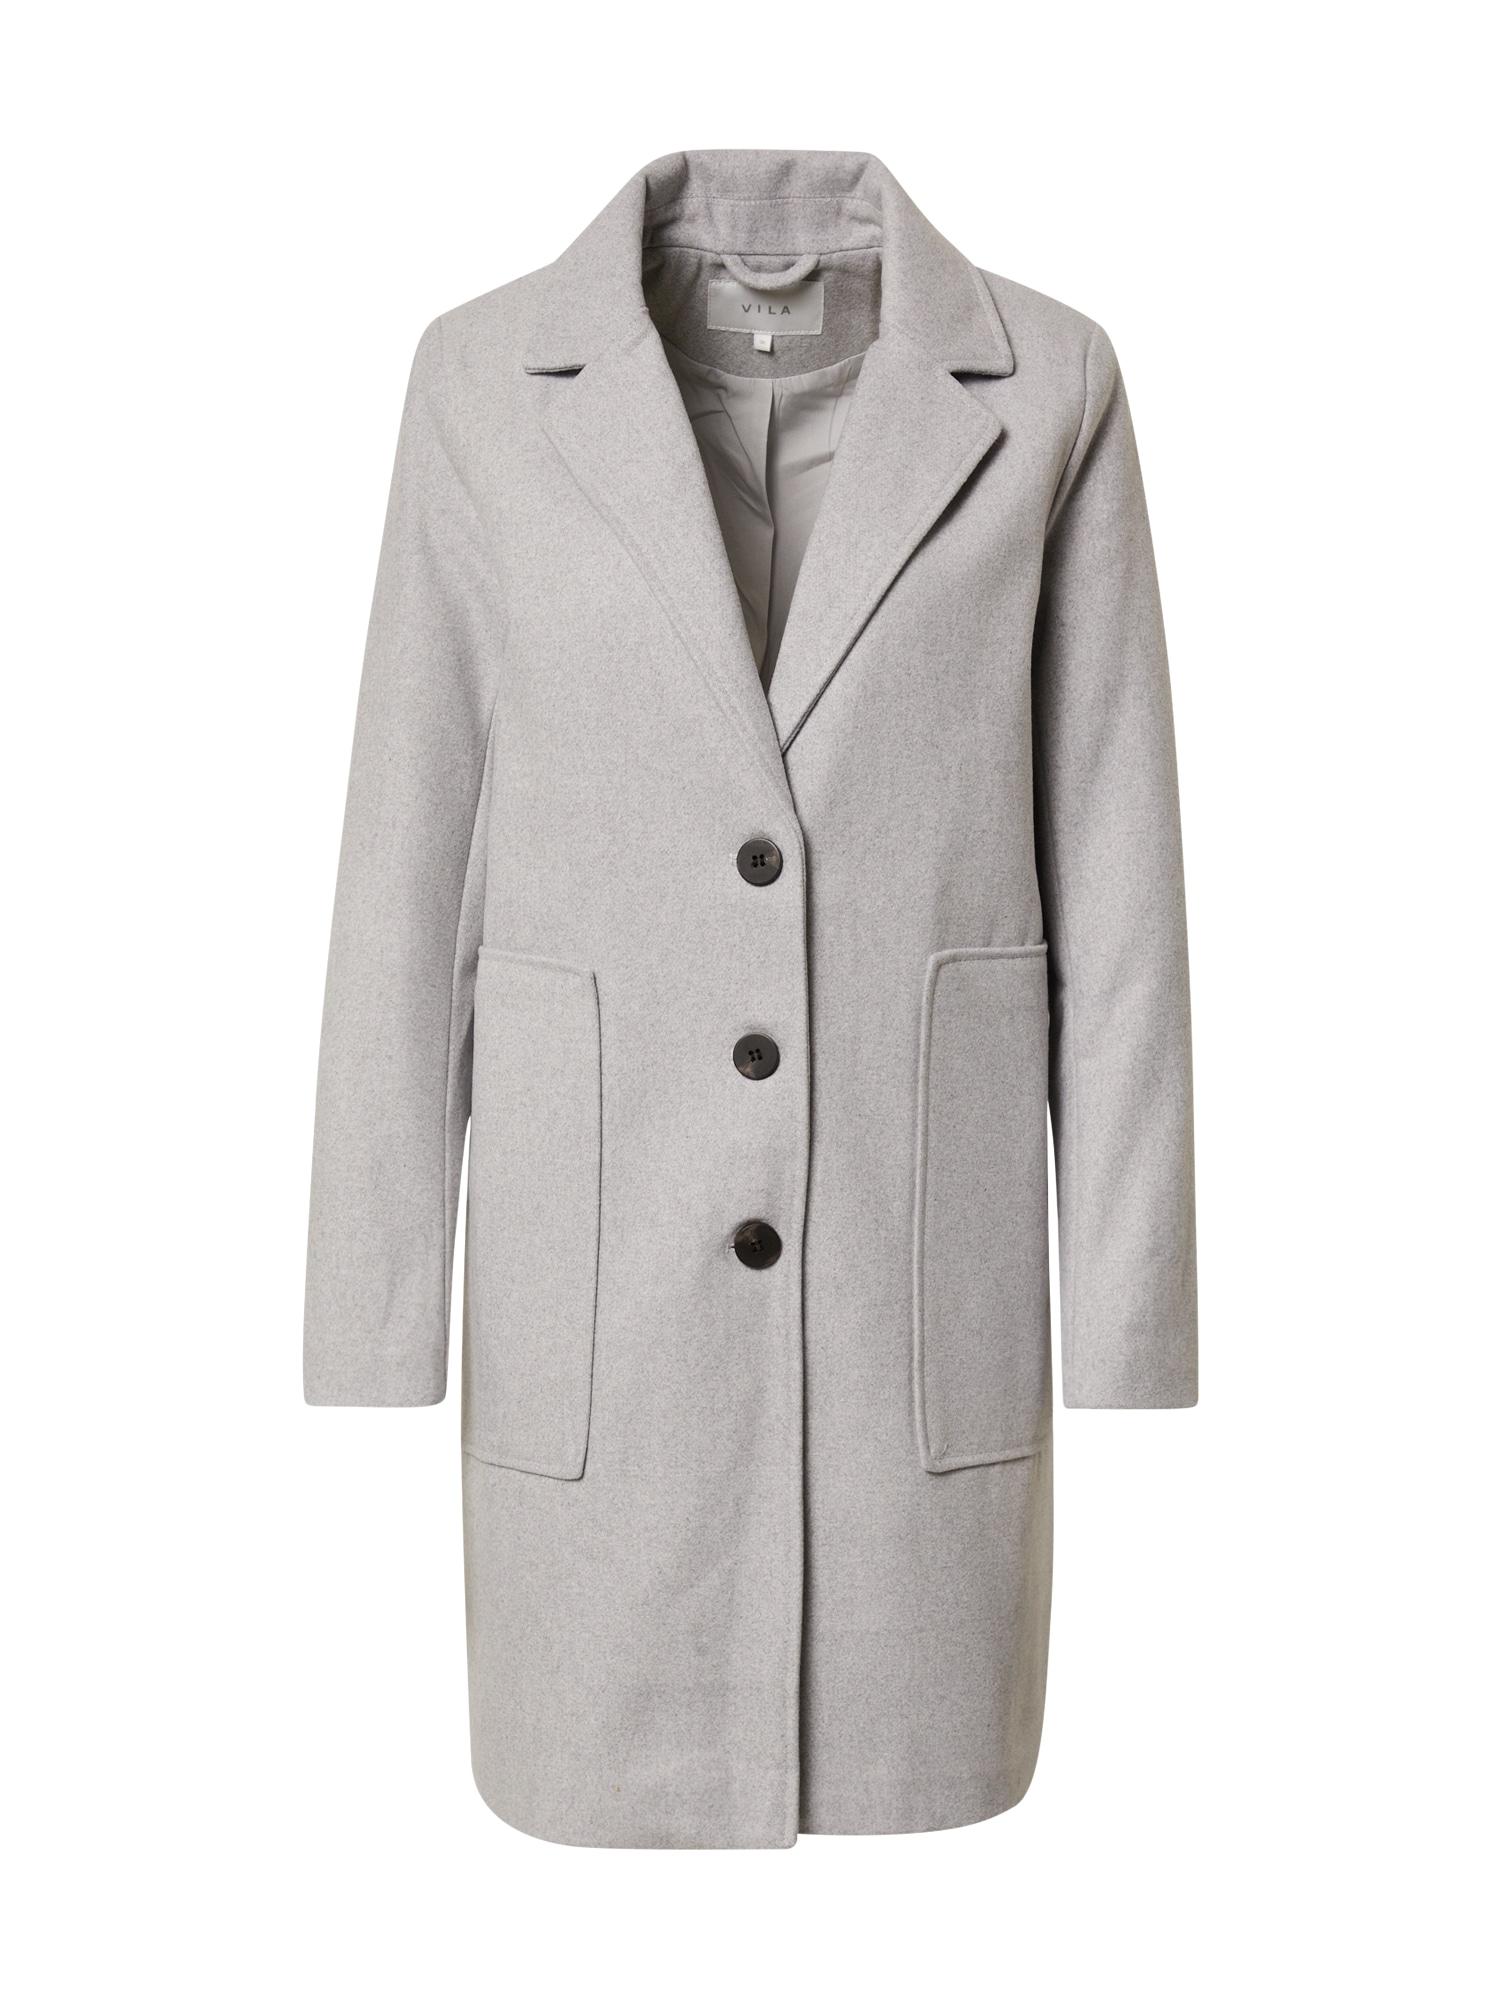 VILA Demisezoninis paltas margai pilka